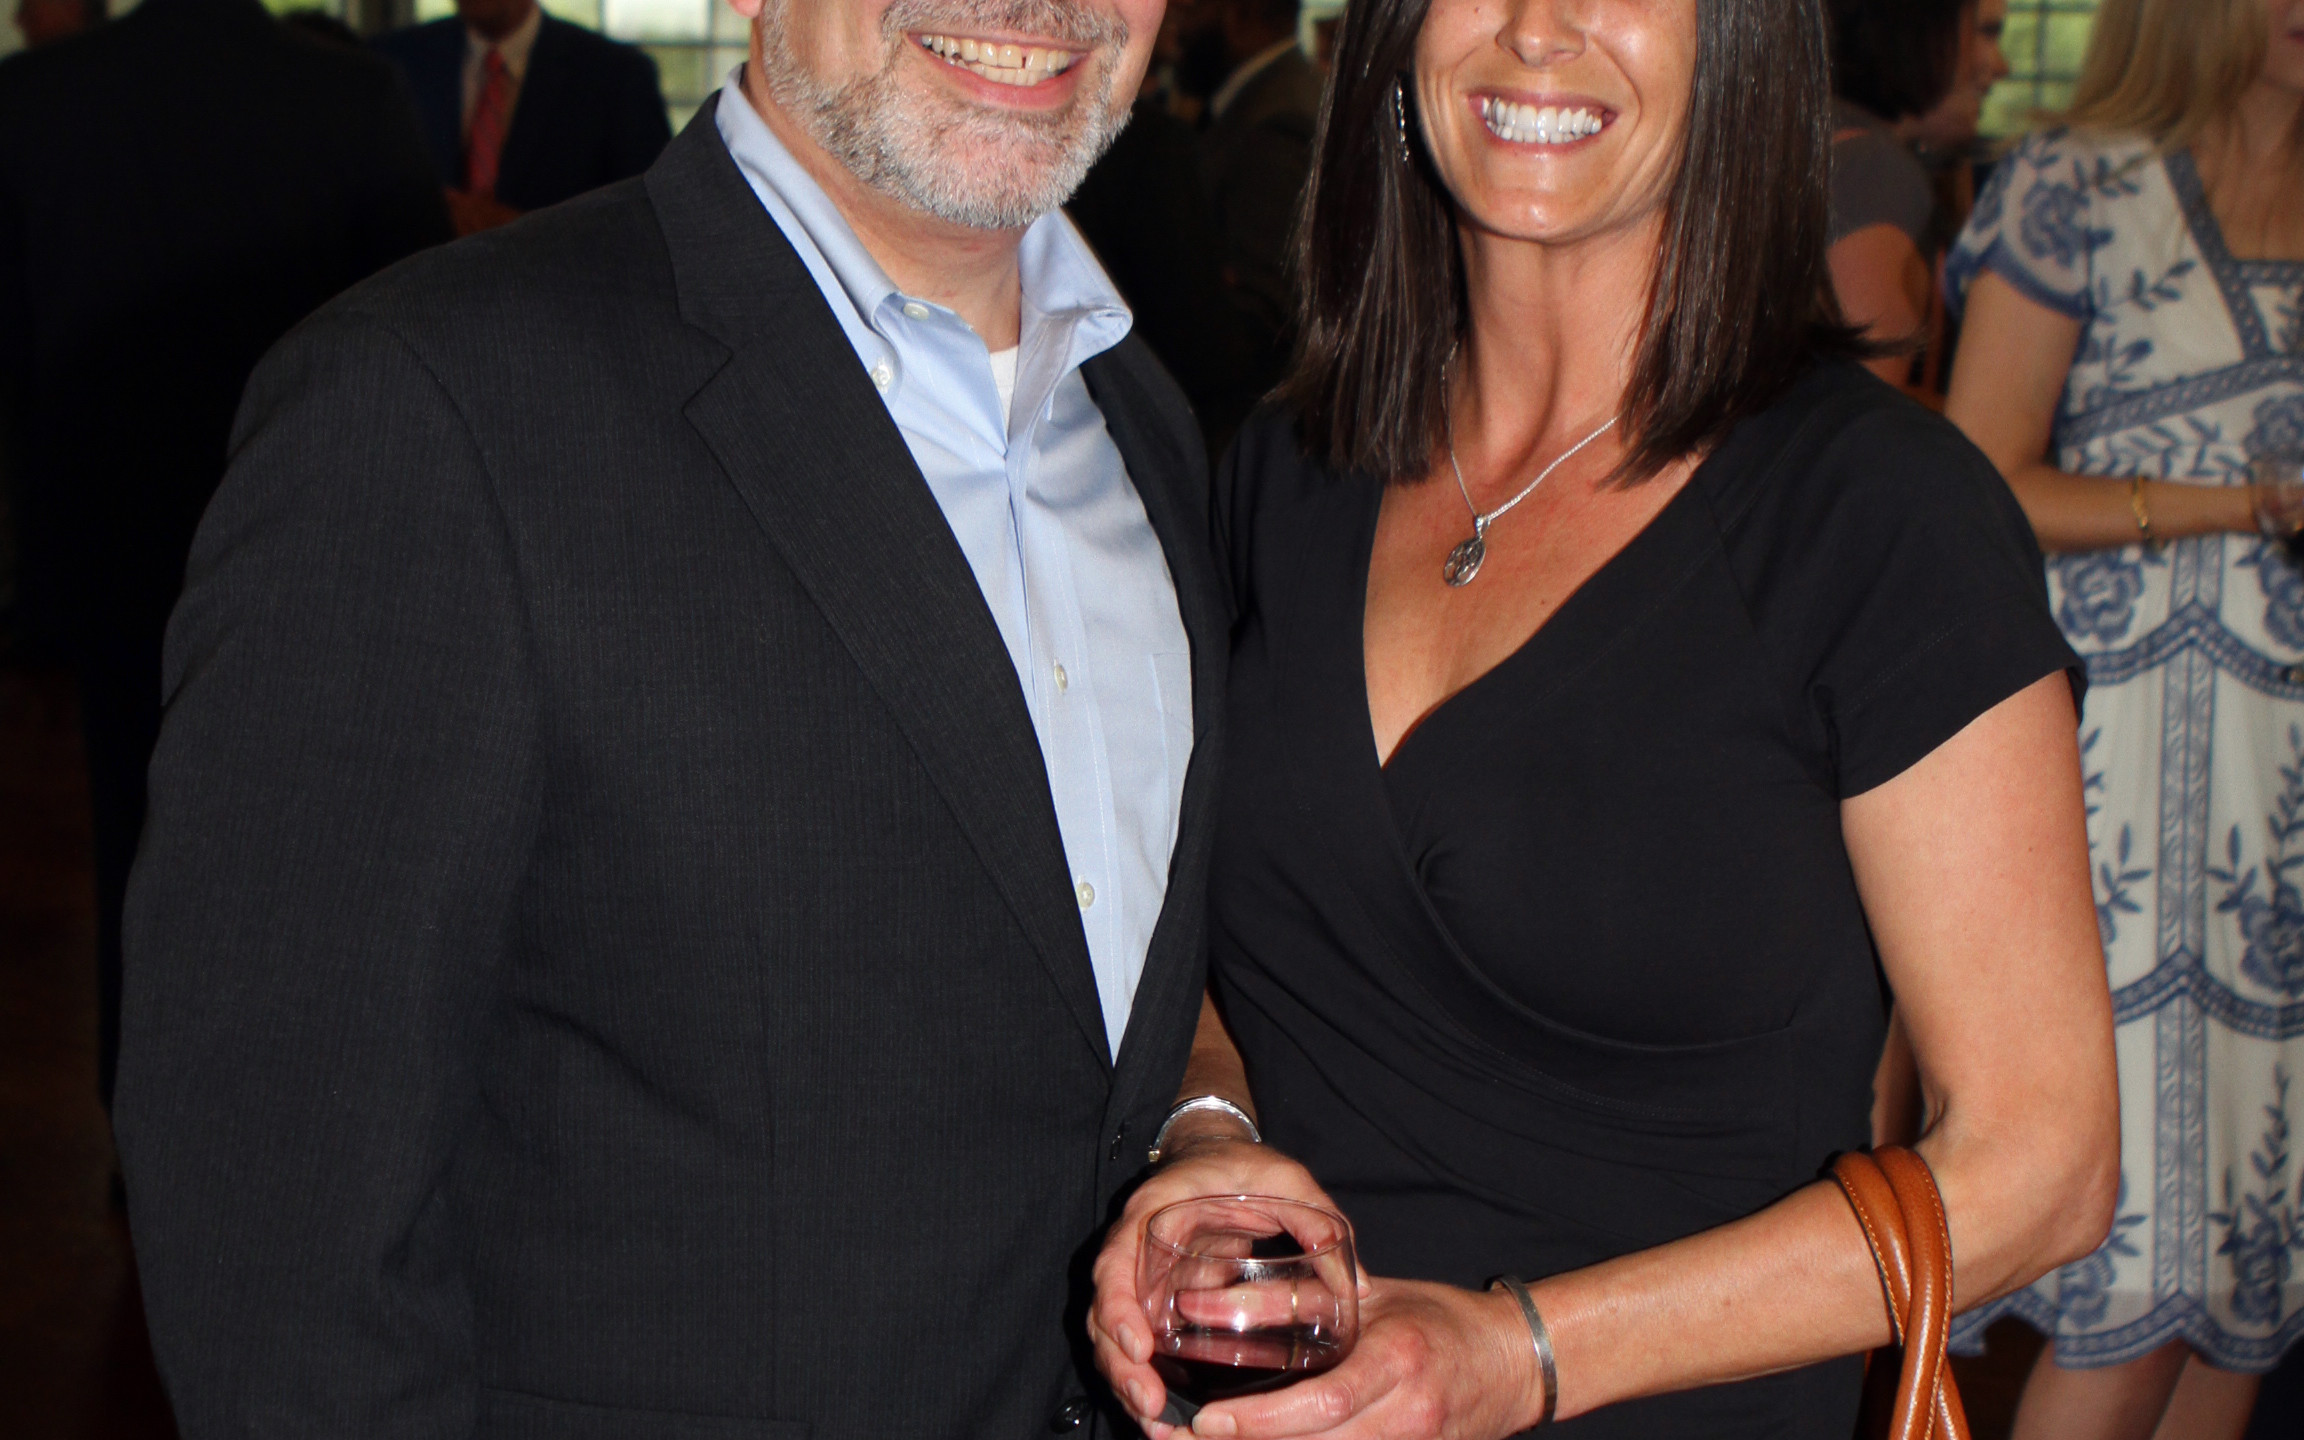 Geoff & Dori Livinsgston